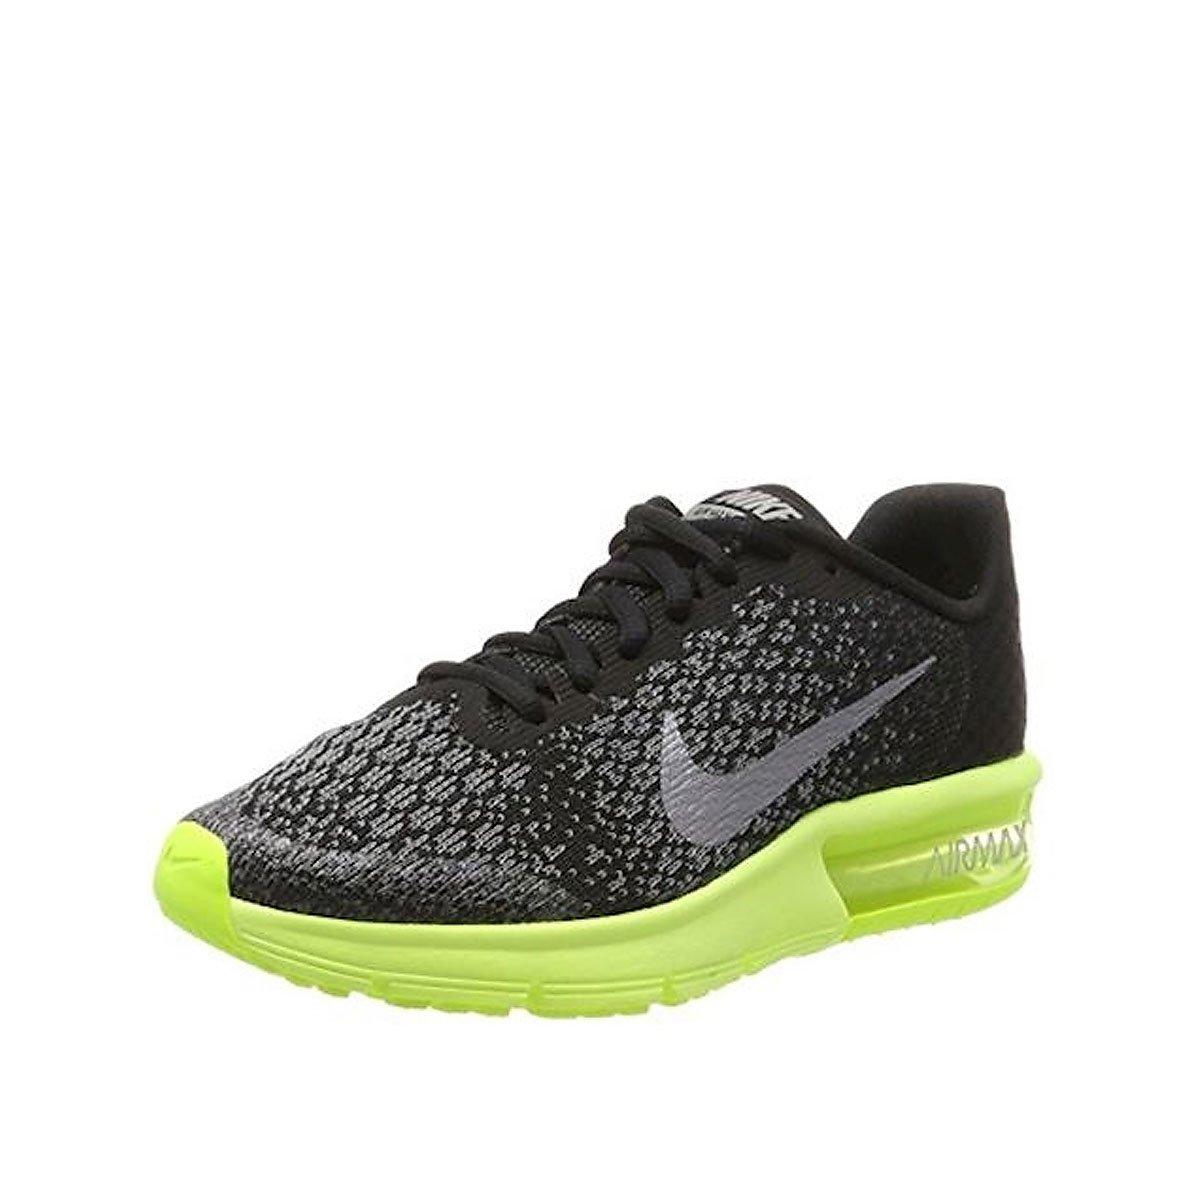 Nike Air Max Sequent 2